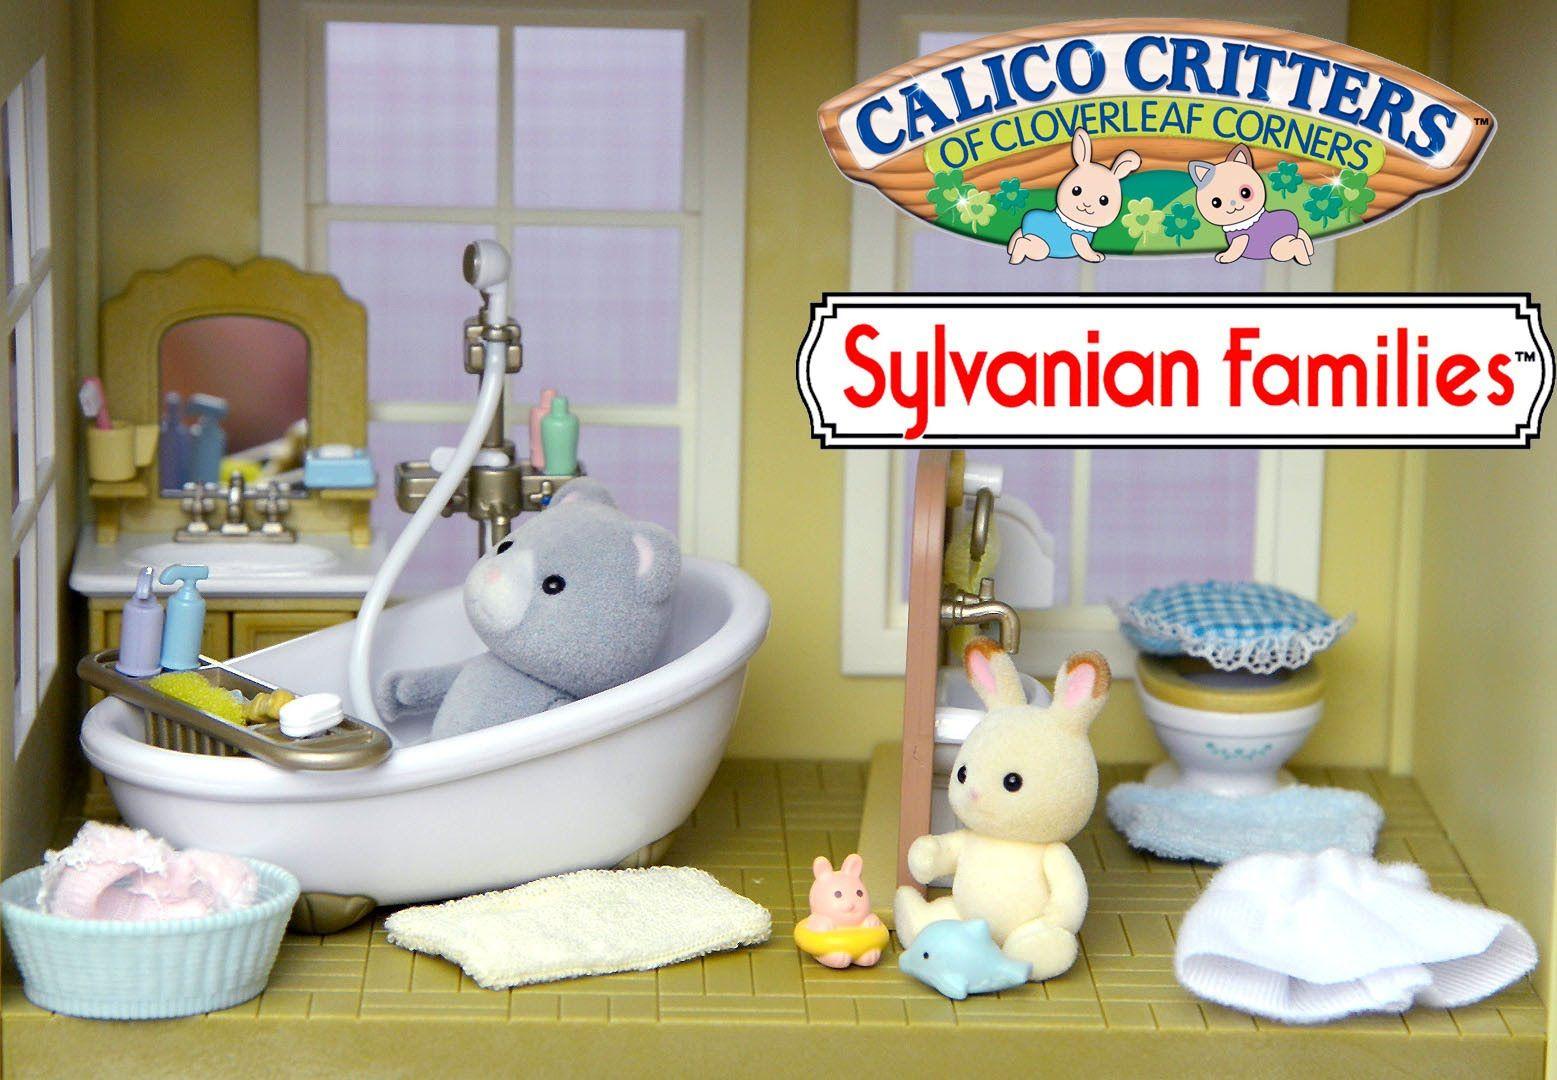 Sylvanian Families Calico Critter Country Bathroom Set